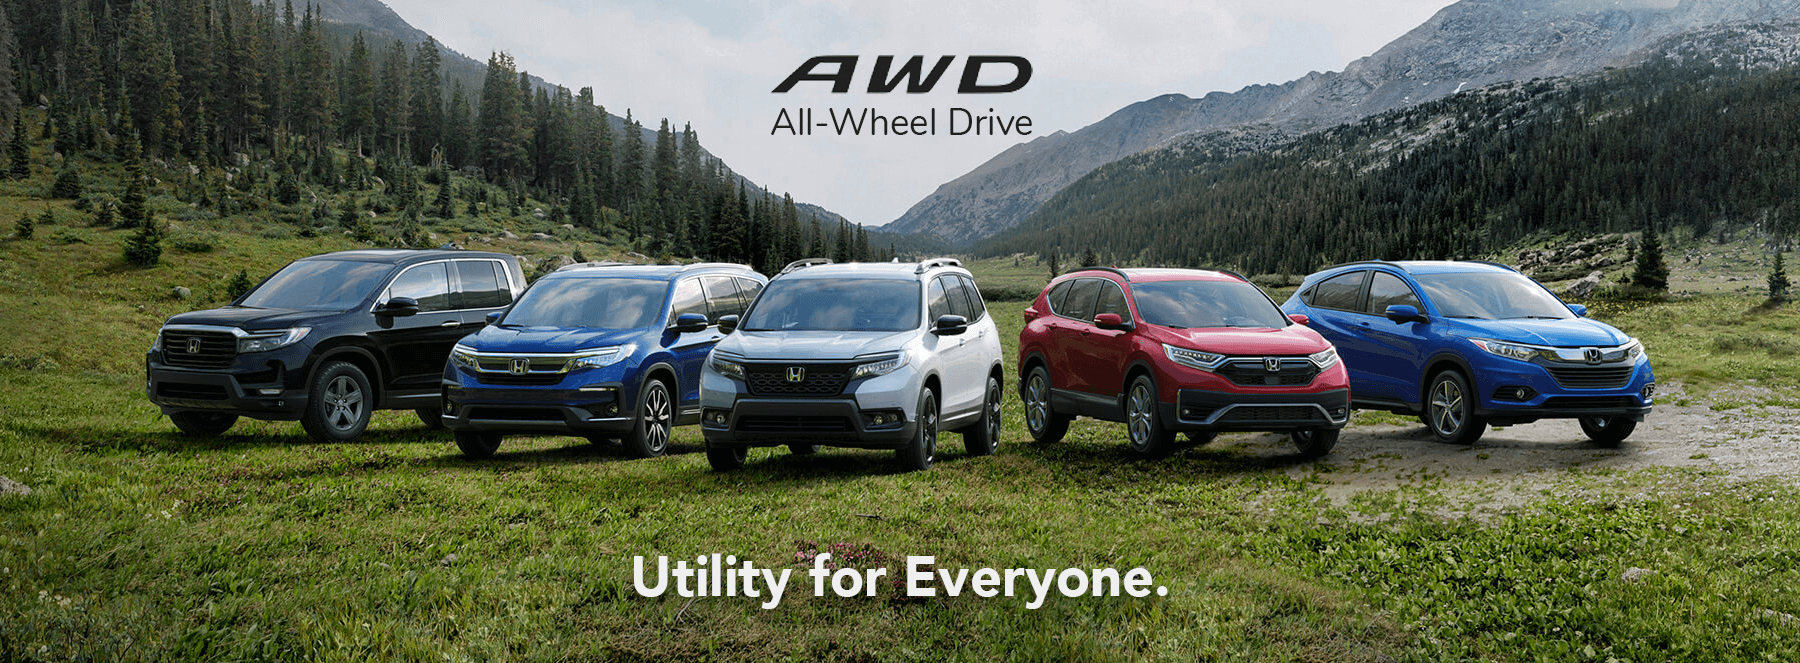 VEHSC Honda AWD Utility for Everyone